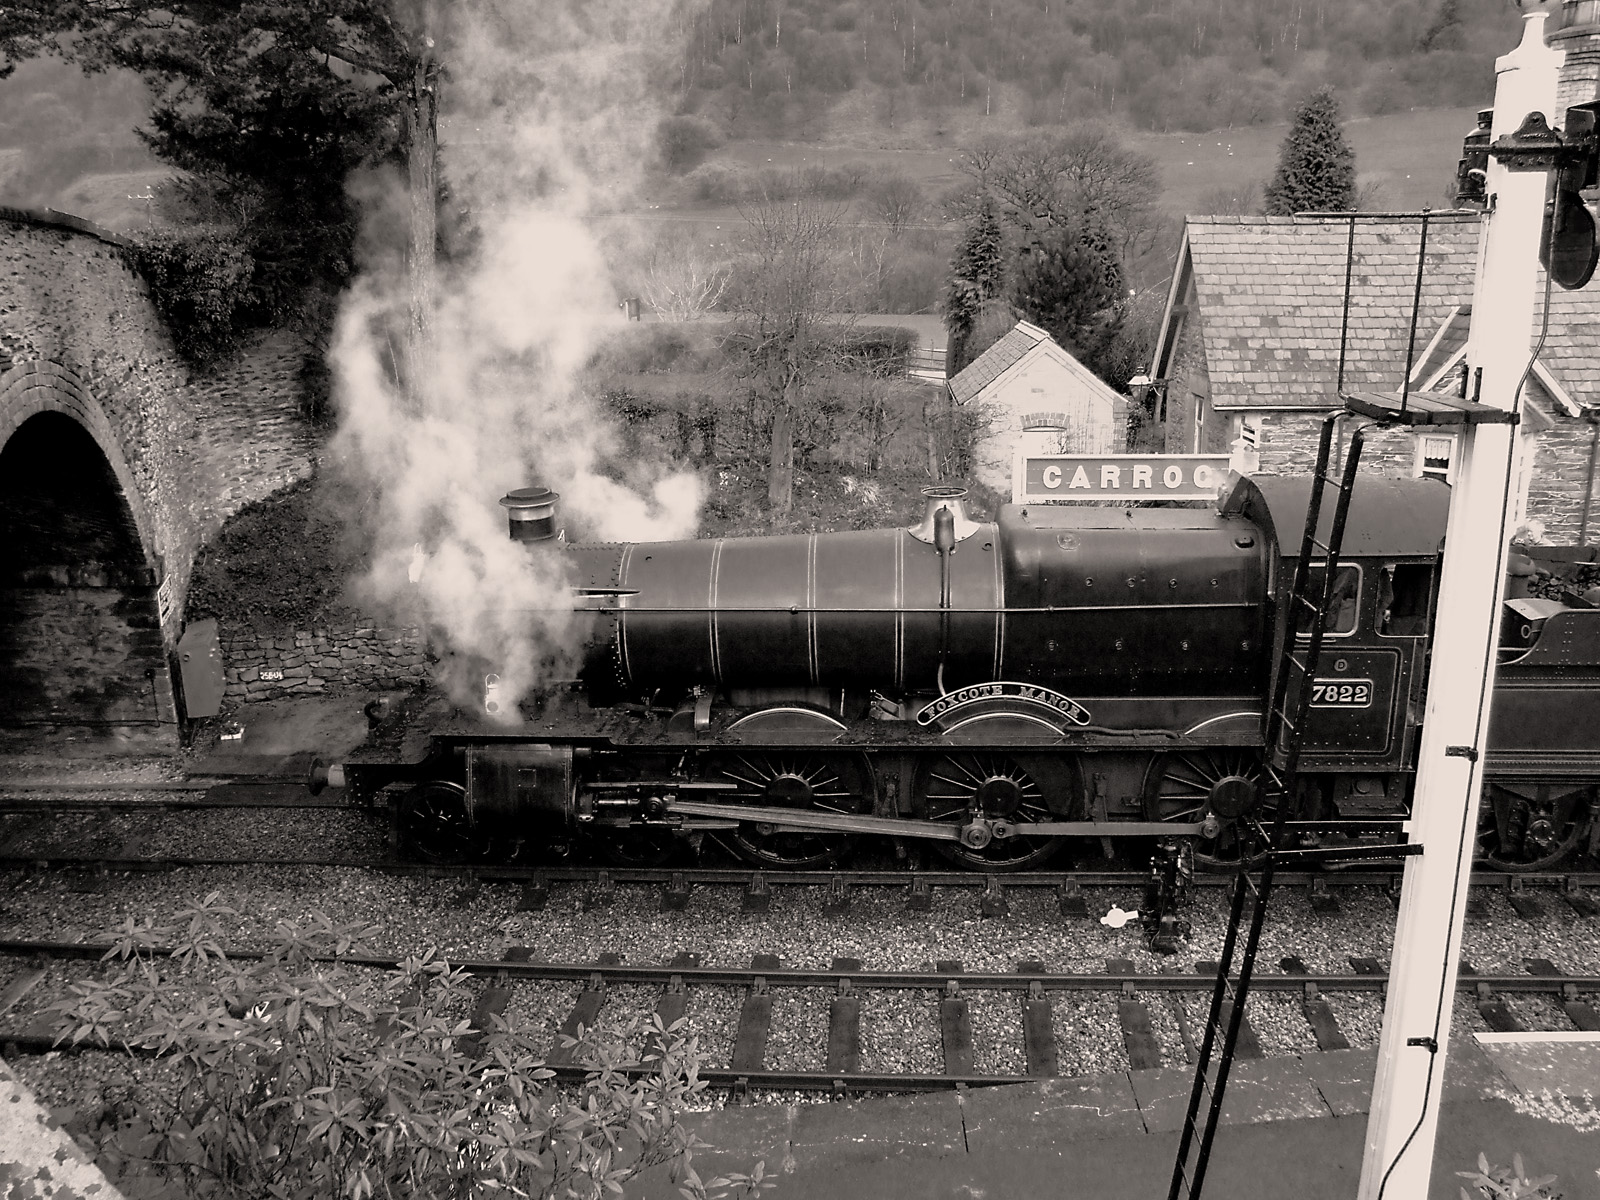 7822 Foxcote Manor at Carrog